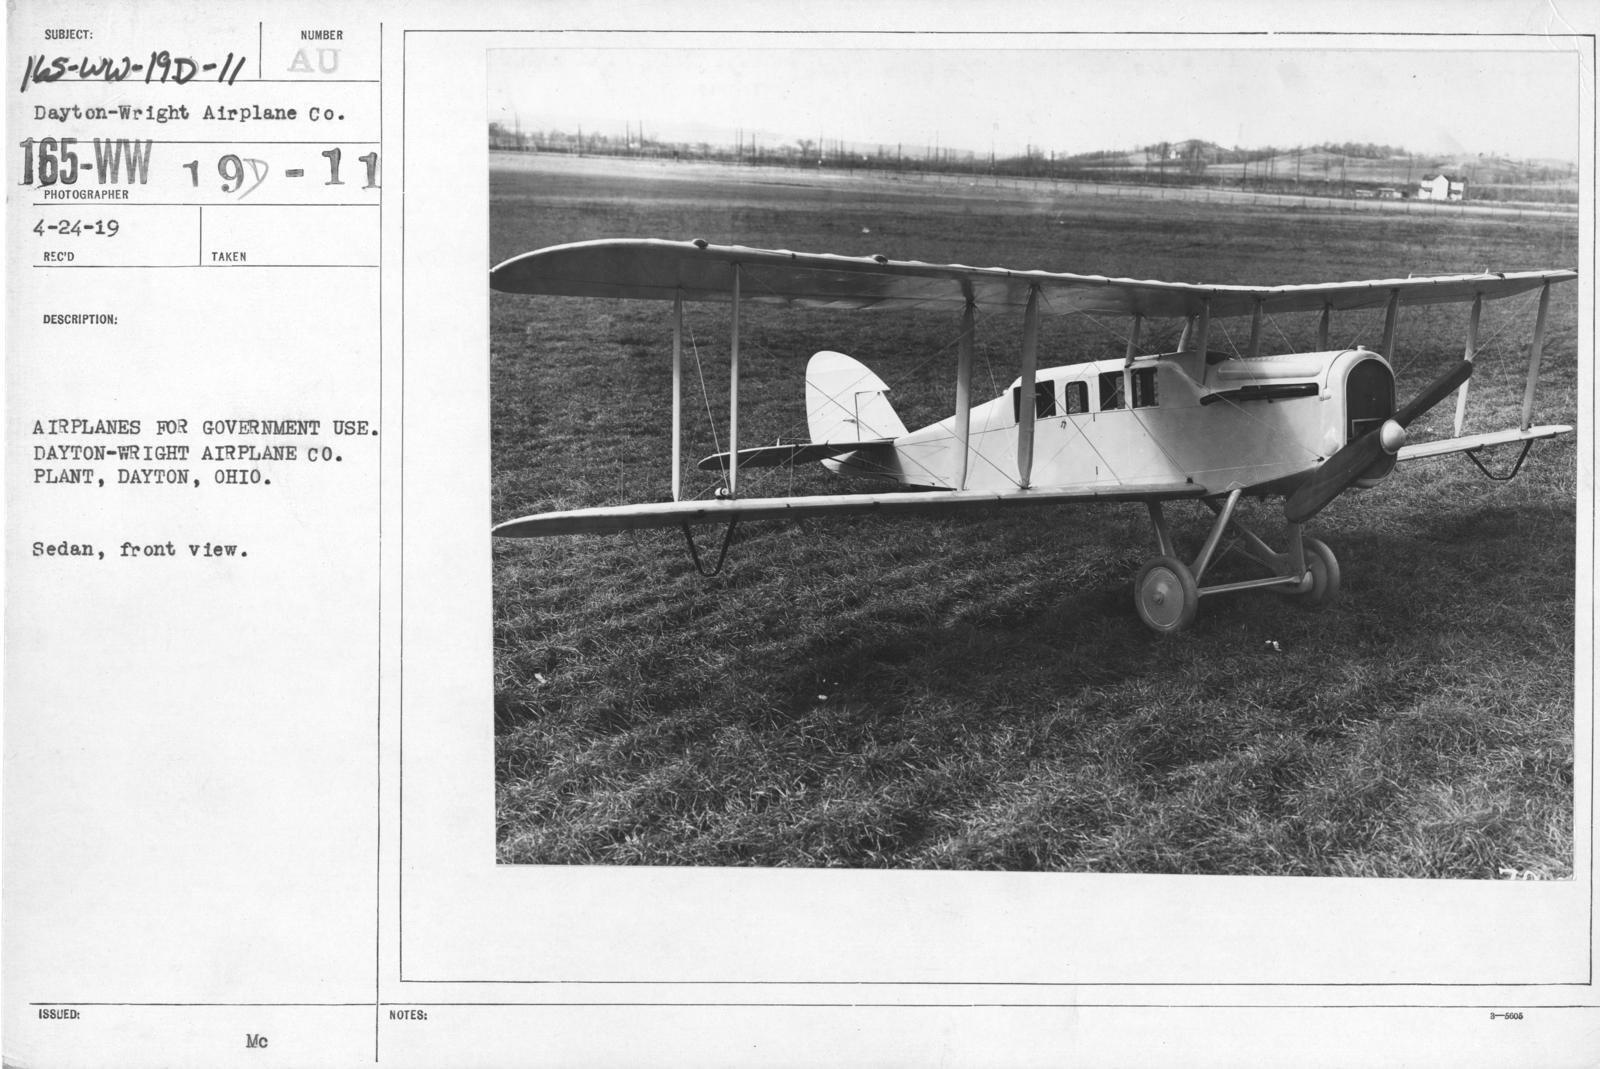 Airplanes - Types - Airplanes for government use. Dayton-Wright Airplane Co. Plant, Dayton, Ohio. Sedan, rear view